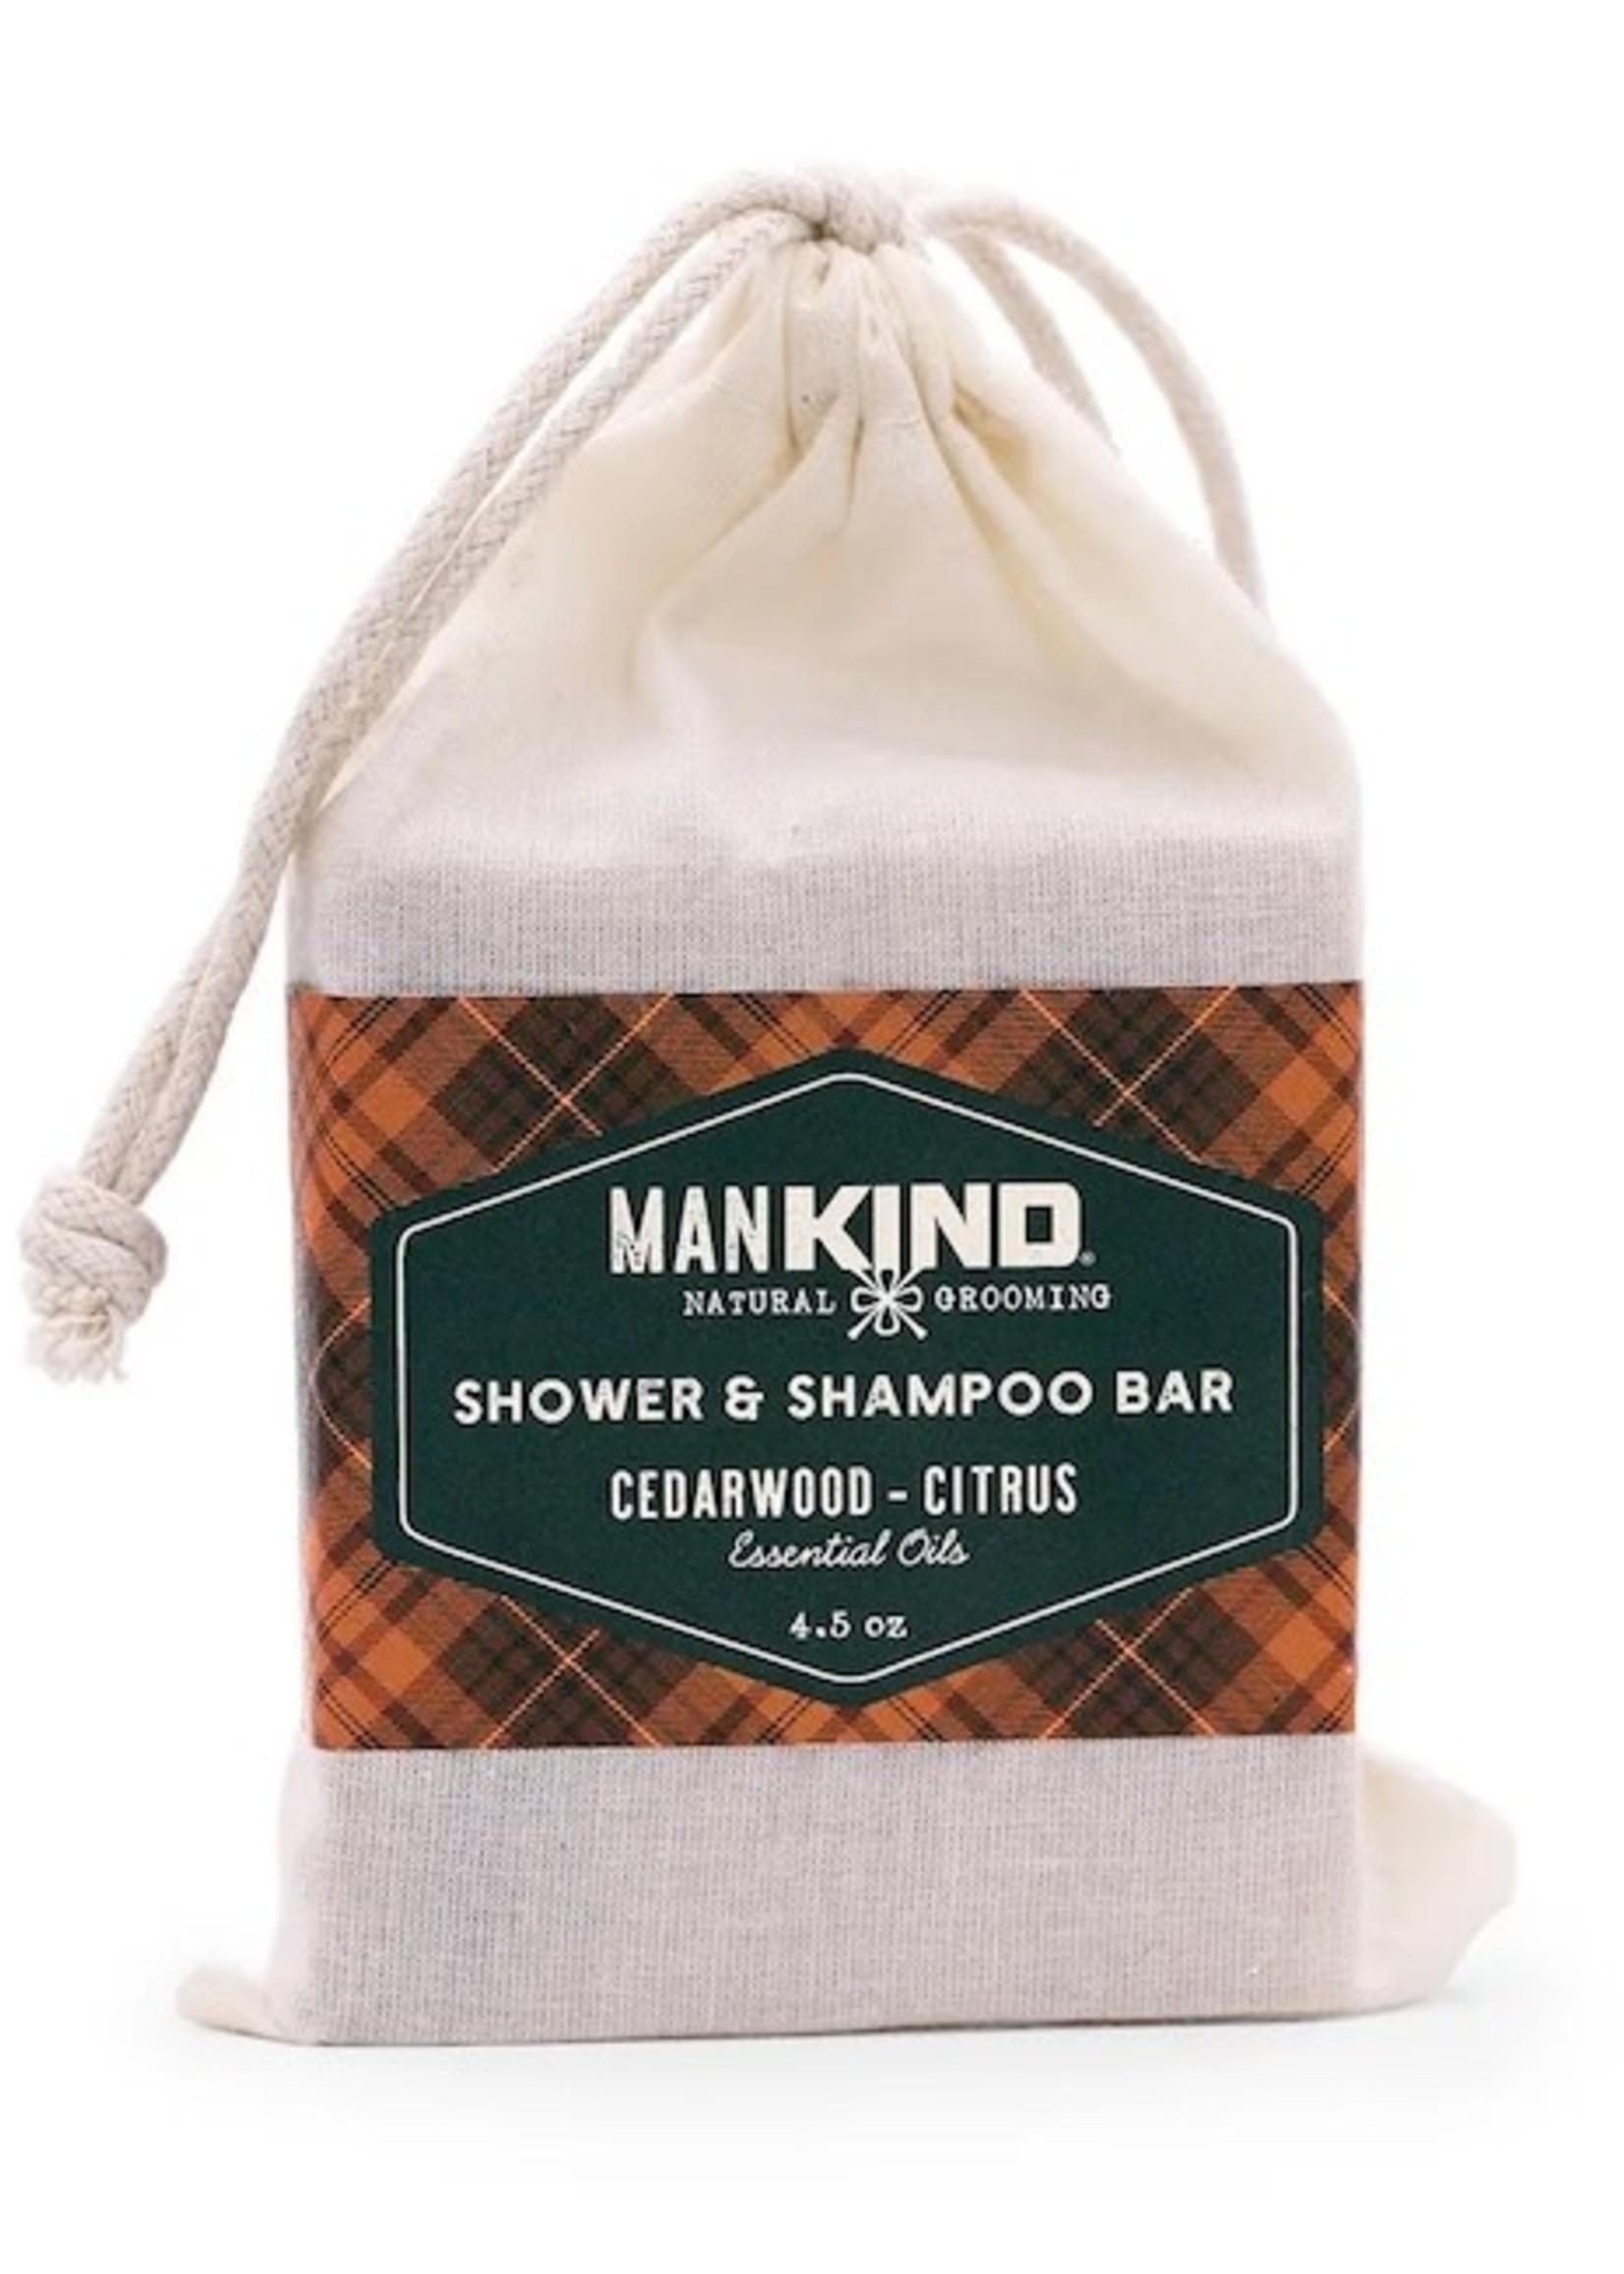 KIND Soap Co Mankind Cedarwood Shampoo/Shower Bar